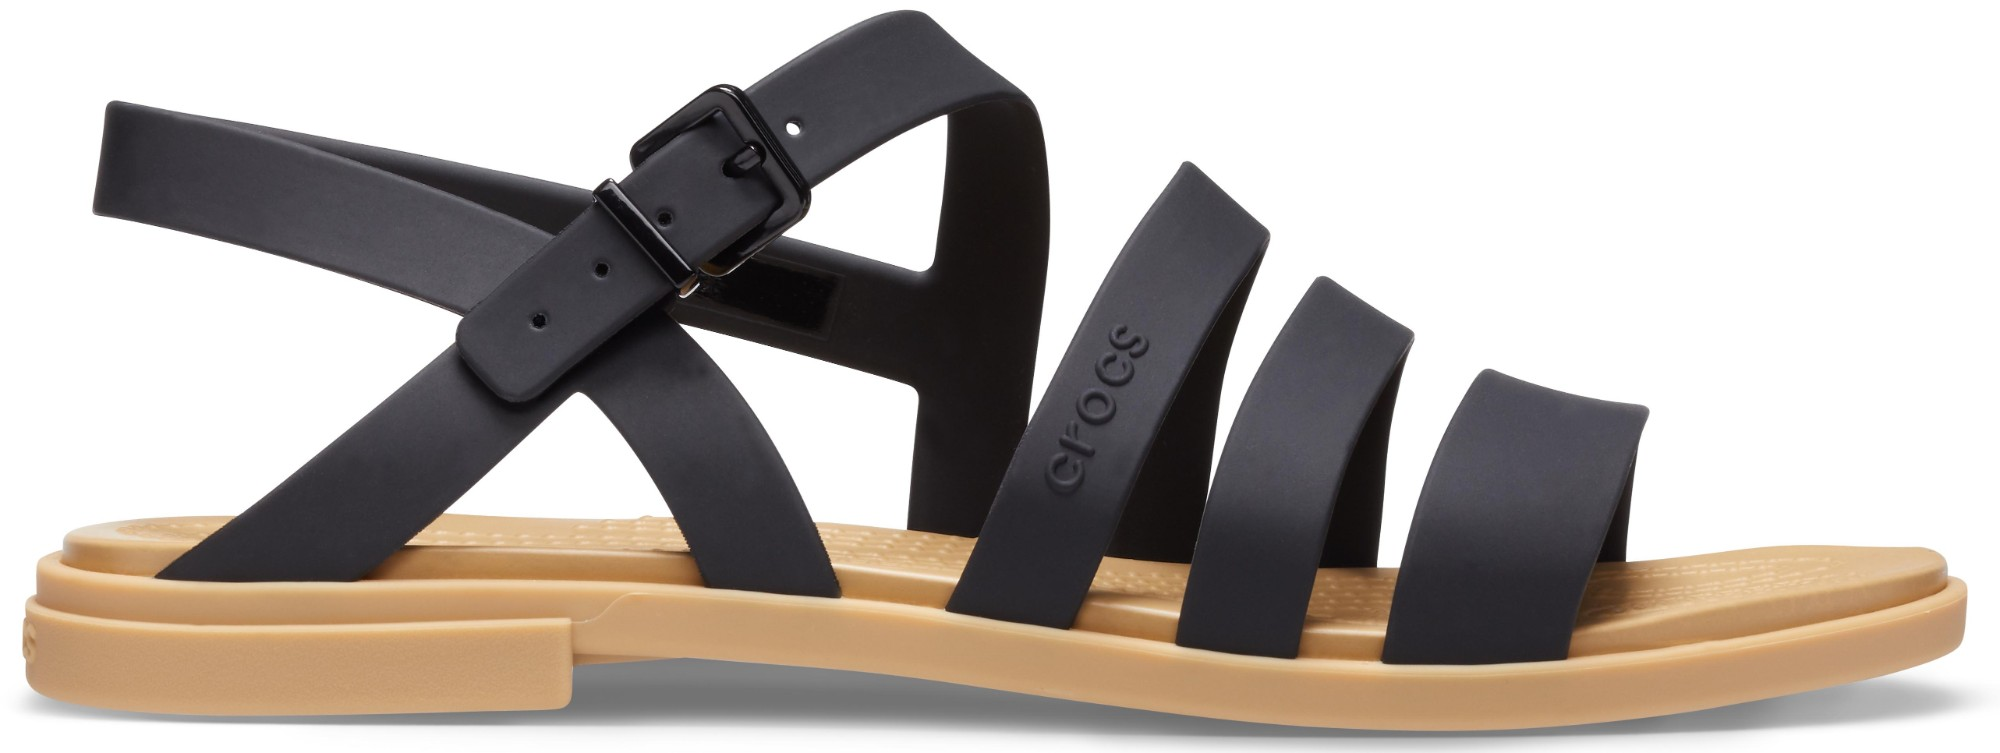 Crocs™ Tulum Sandal Womens Black/Tan 42,5